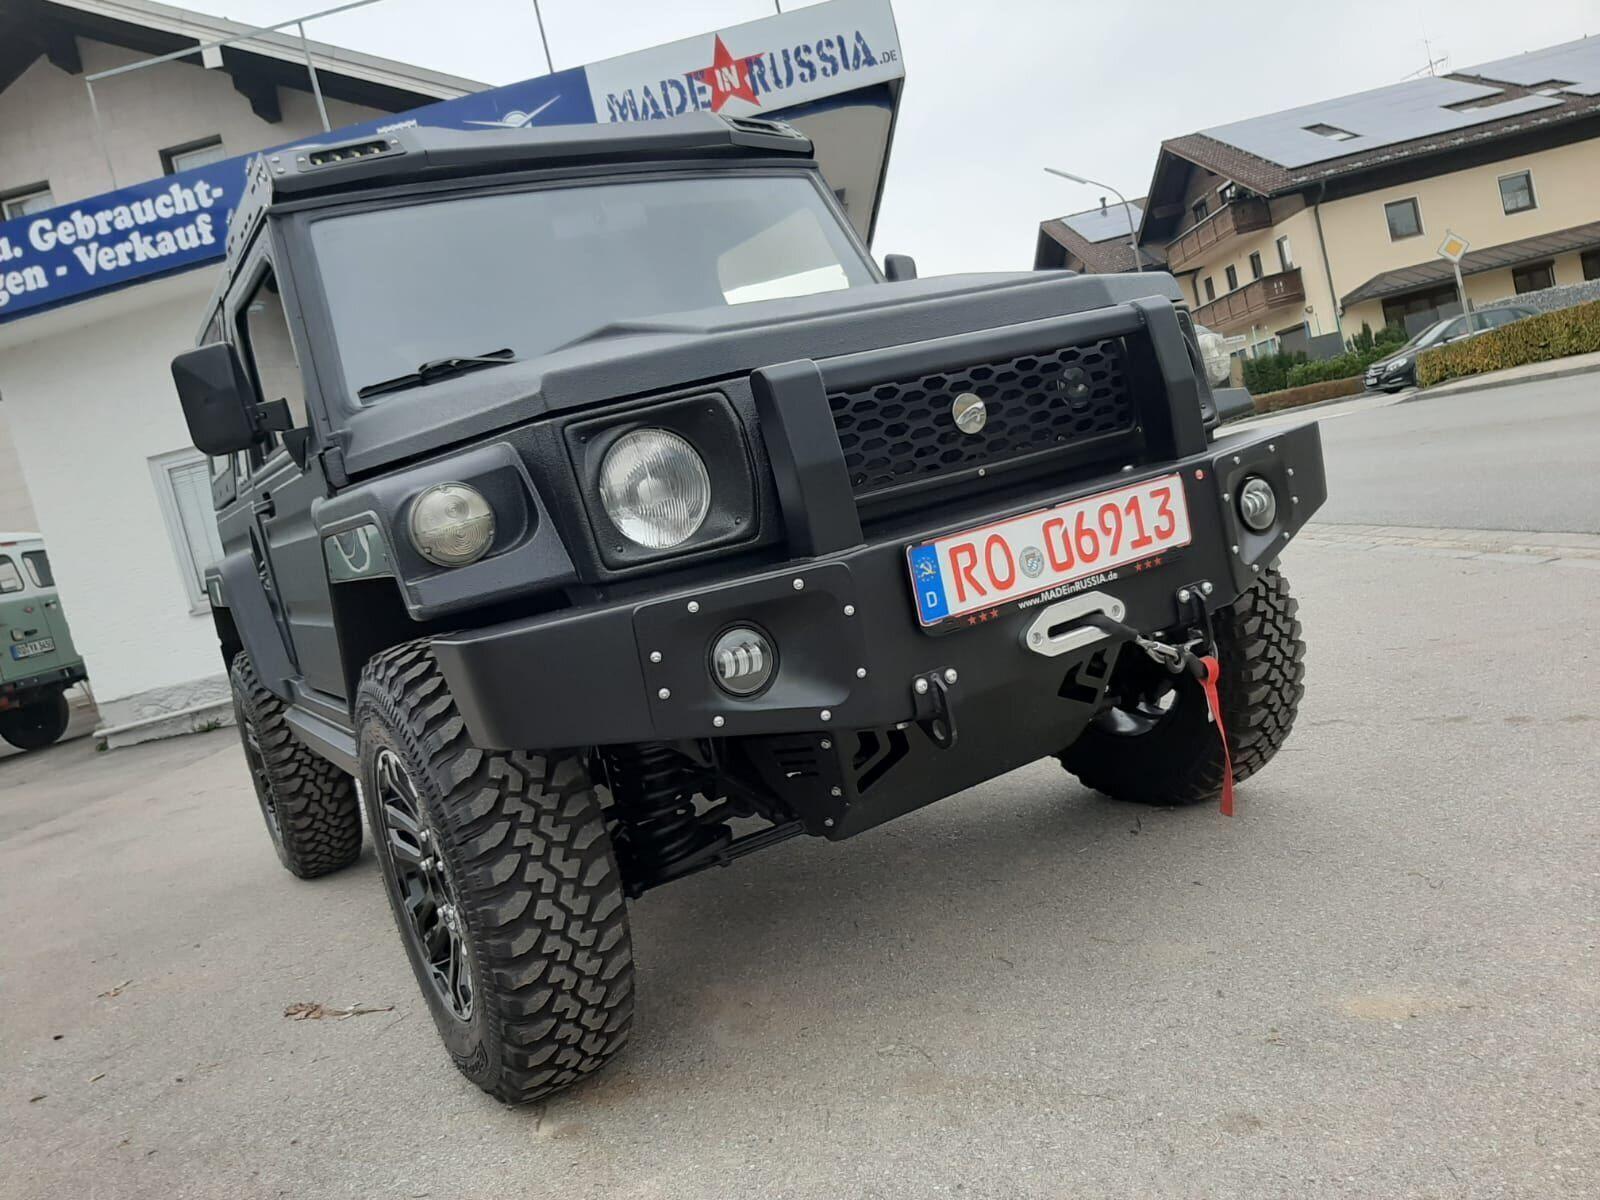 Apal Jaeger